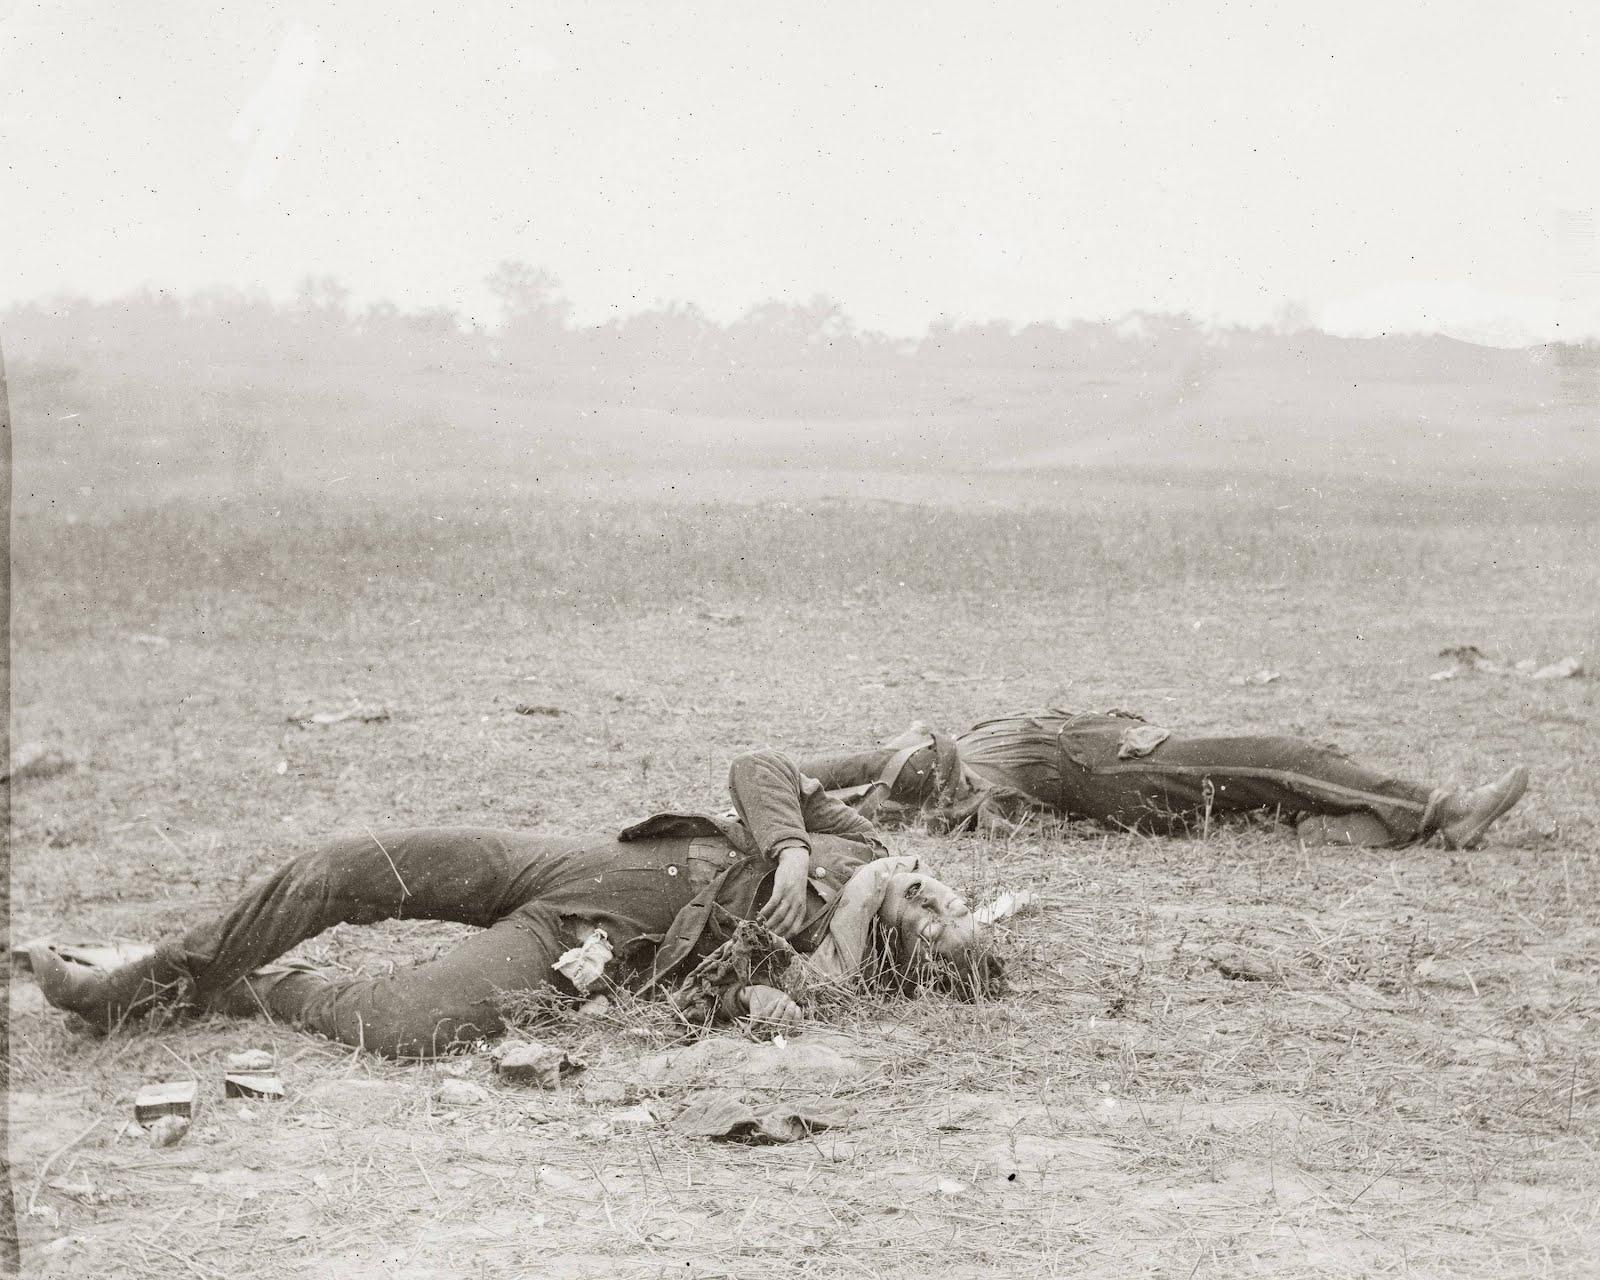 Alexander Gardner,  Confederate Soldiers as they fell by Burnside Bridge ,photograph at Antietam battlefield,September 1863.